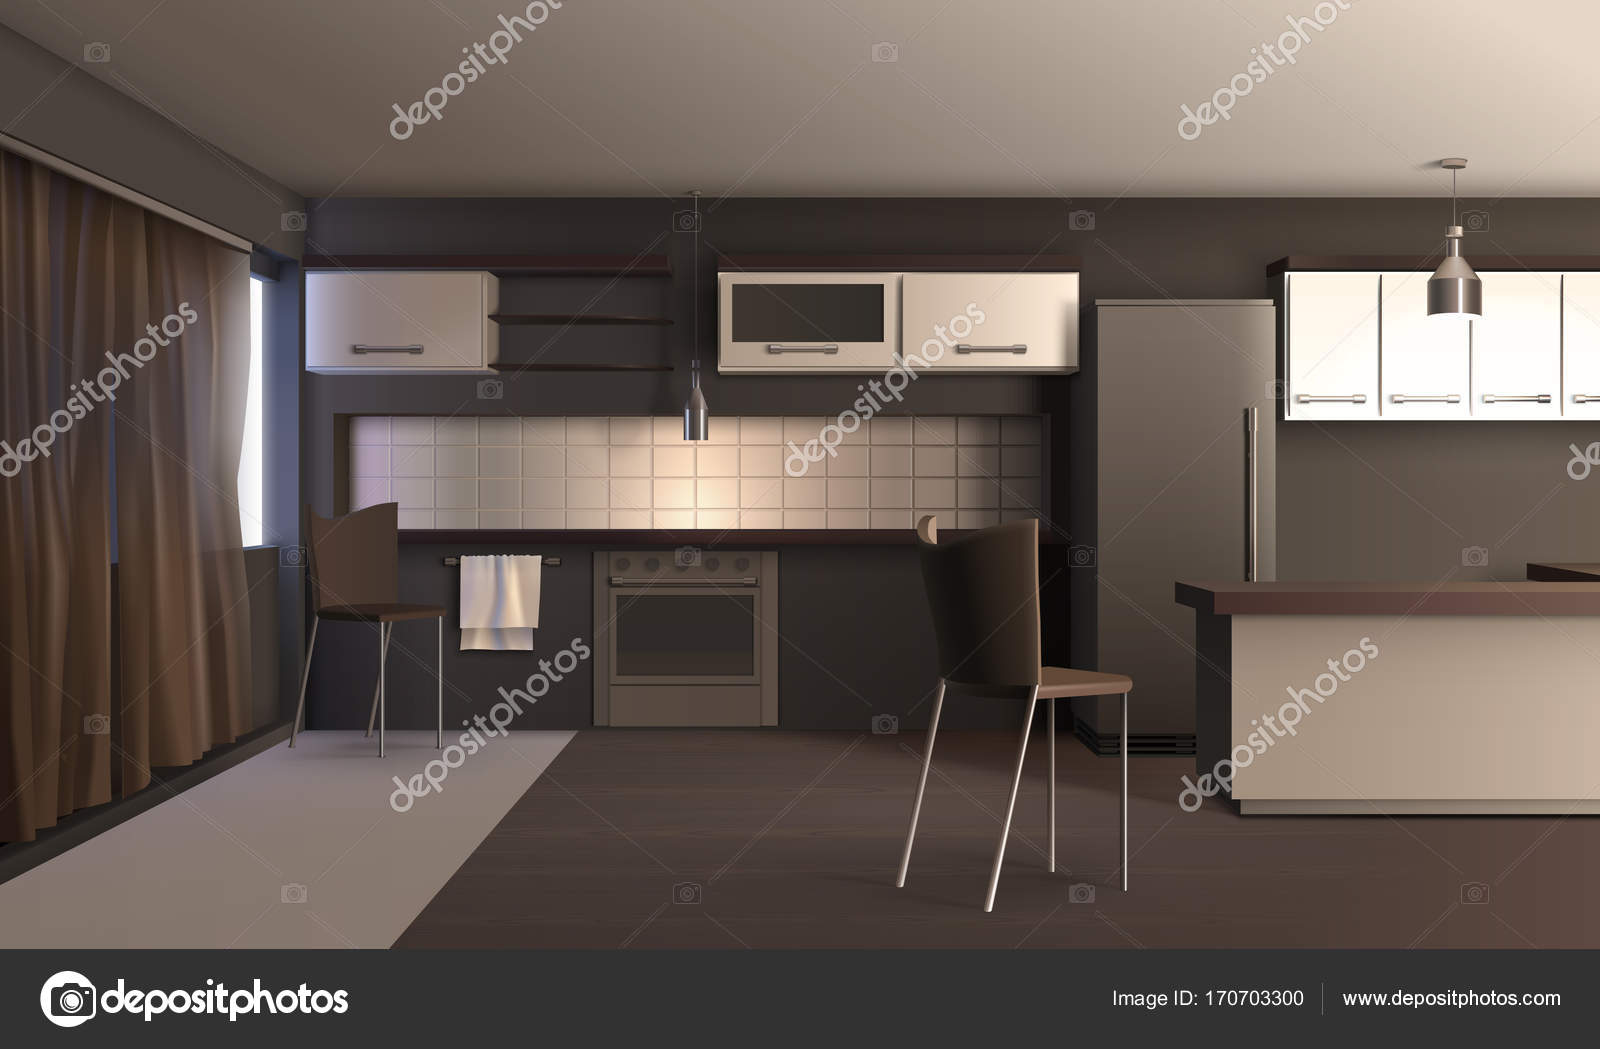 Projeto Da Cozinha De Apartamento Vetor De Stock Macrovector